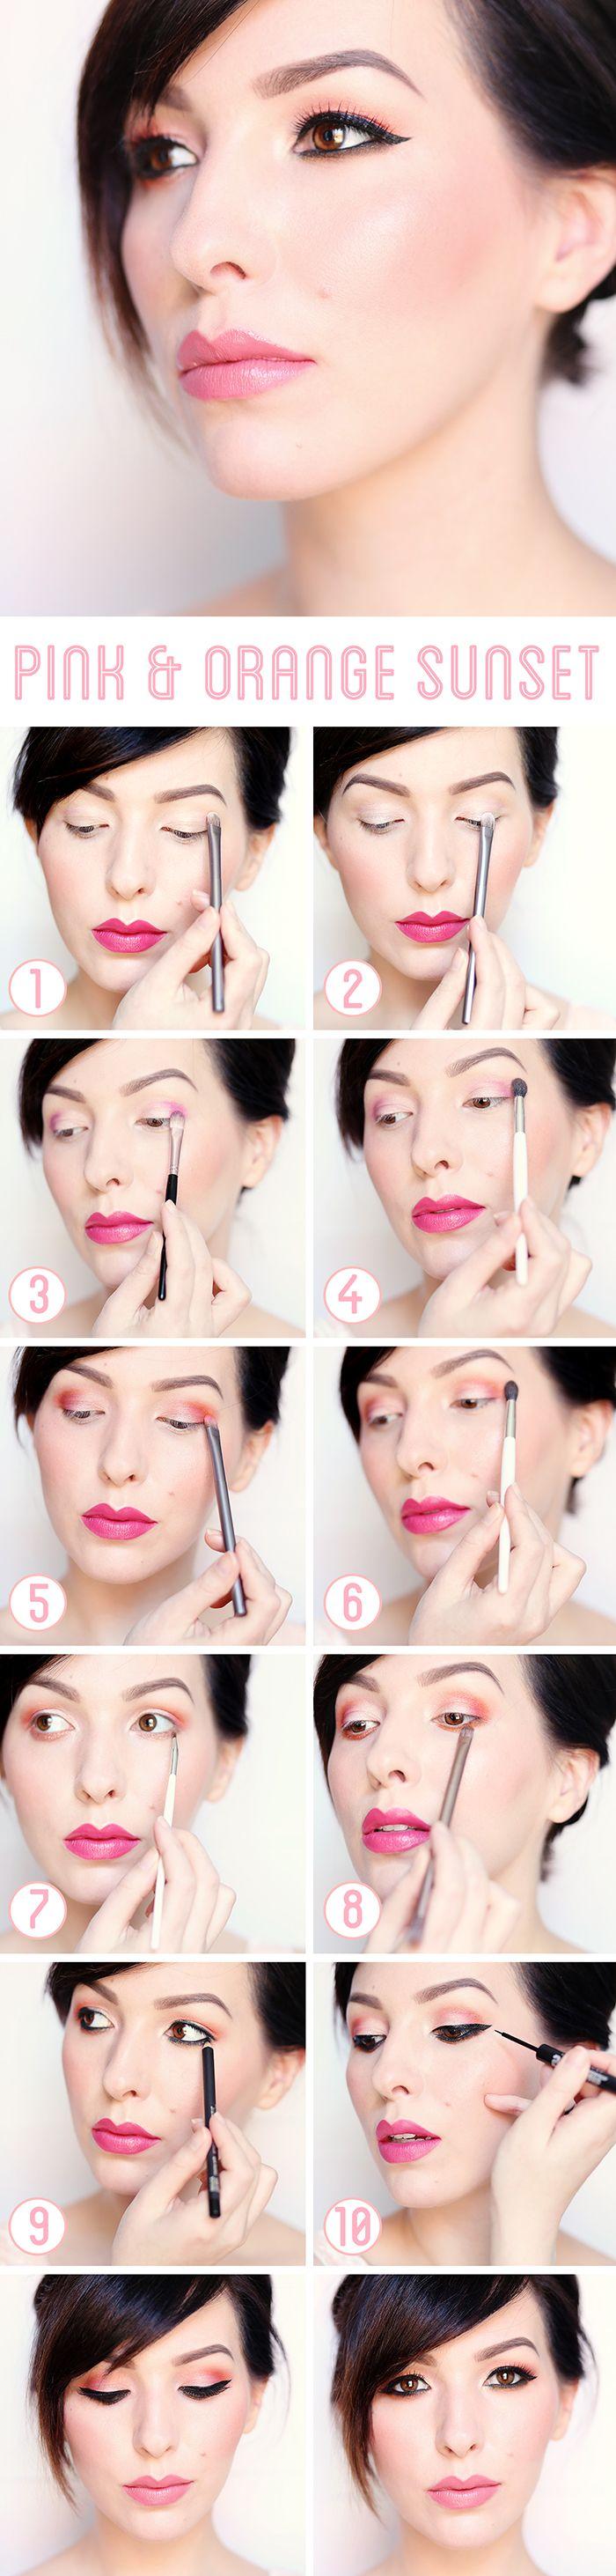 Makeup Monday: Pink and Orange Sunset Tutorial - Keiko Lynn